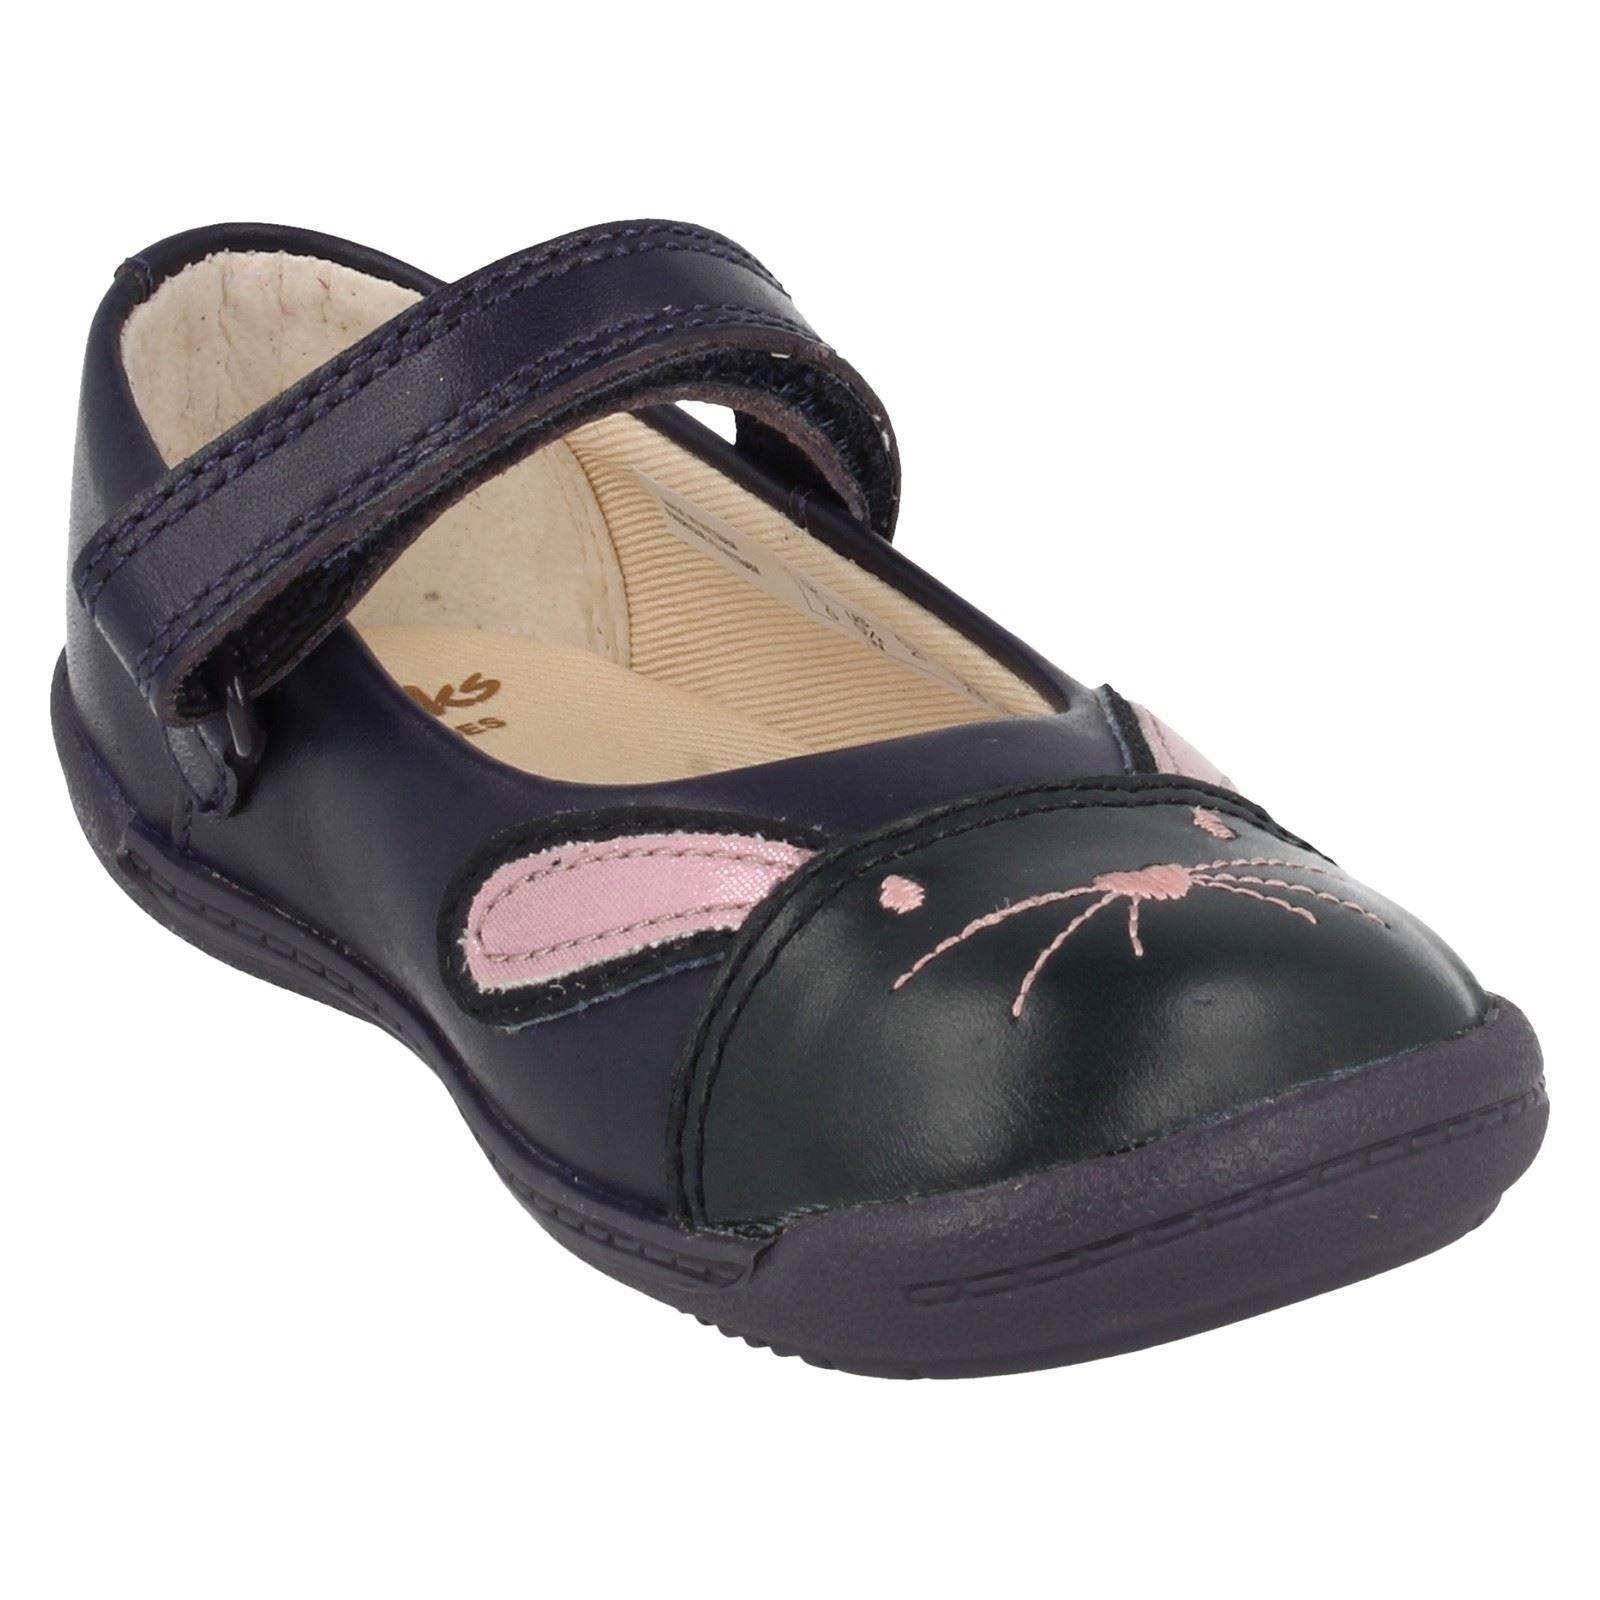 Niñas azul marino 'iva azul zapatos Primeros Bunny' Clarks SqwvrS